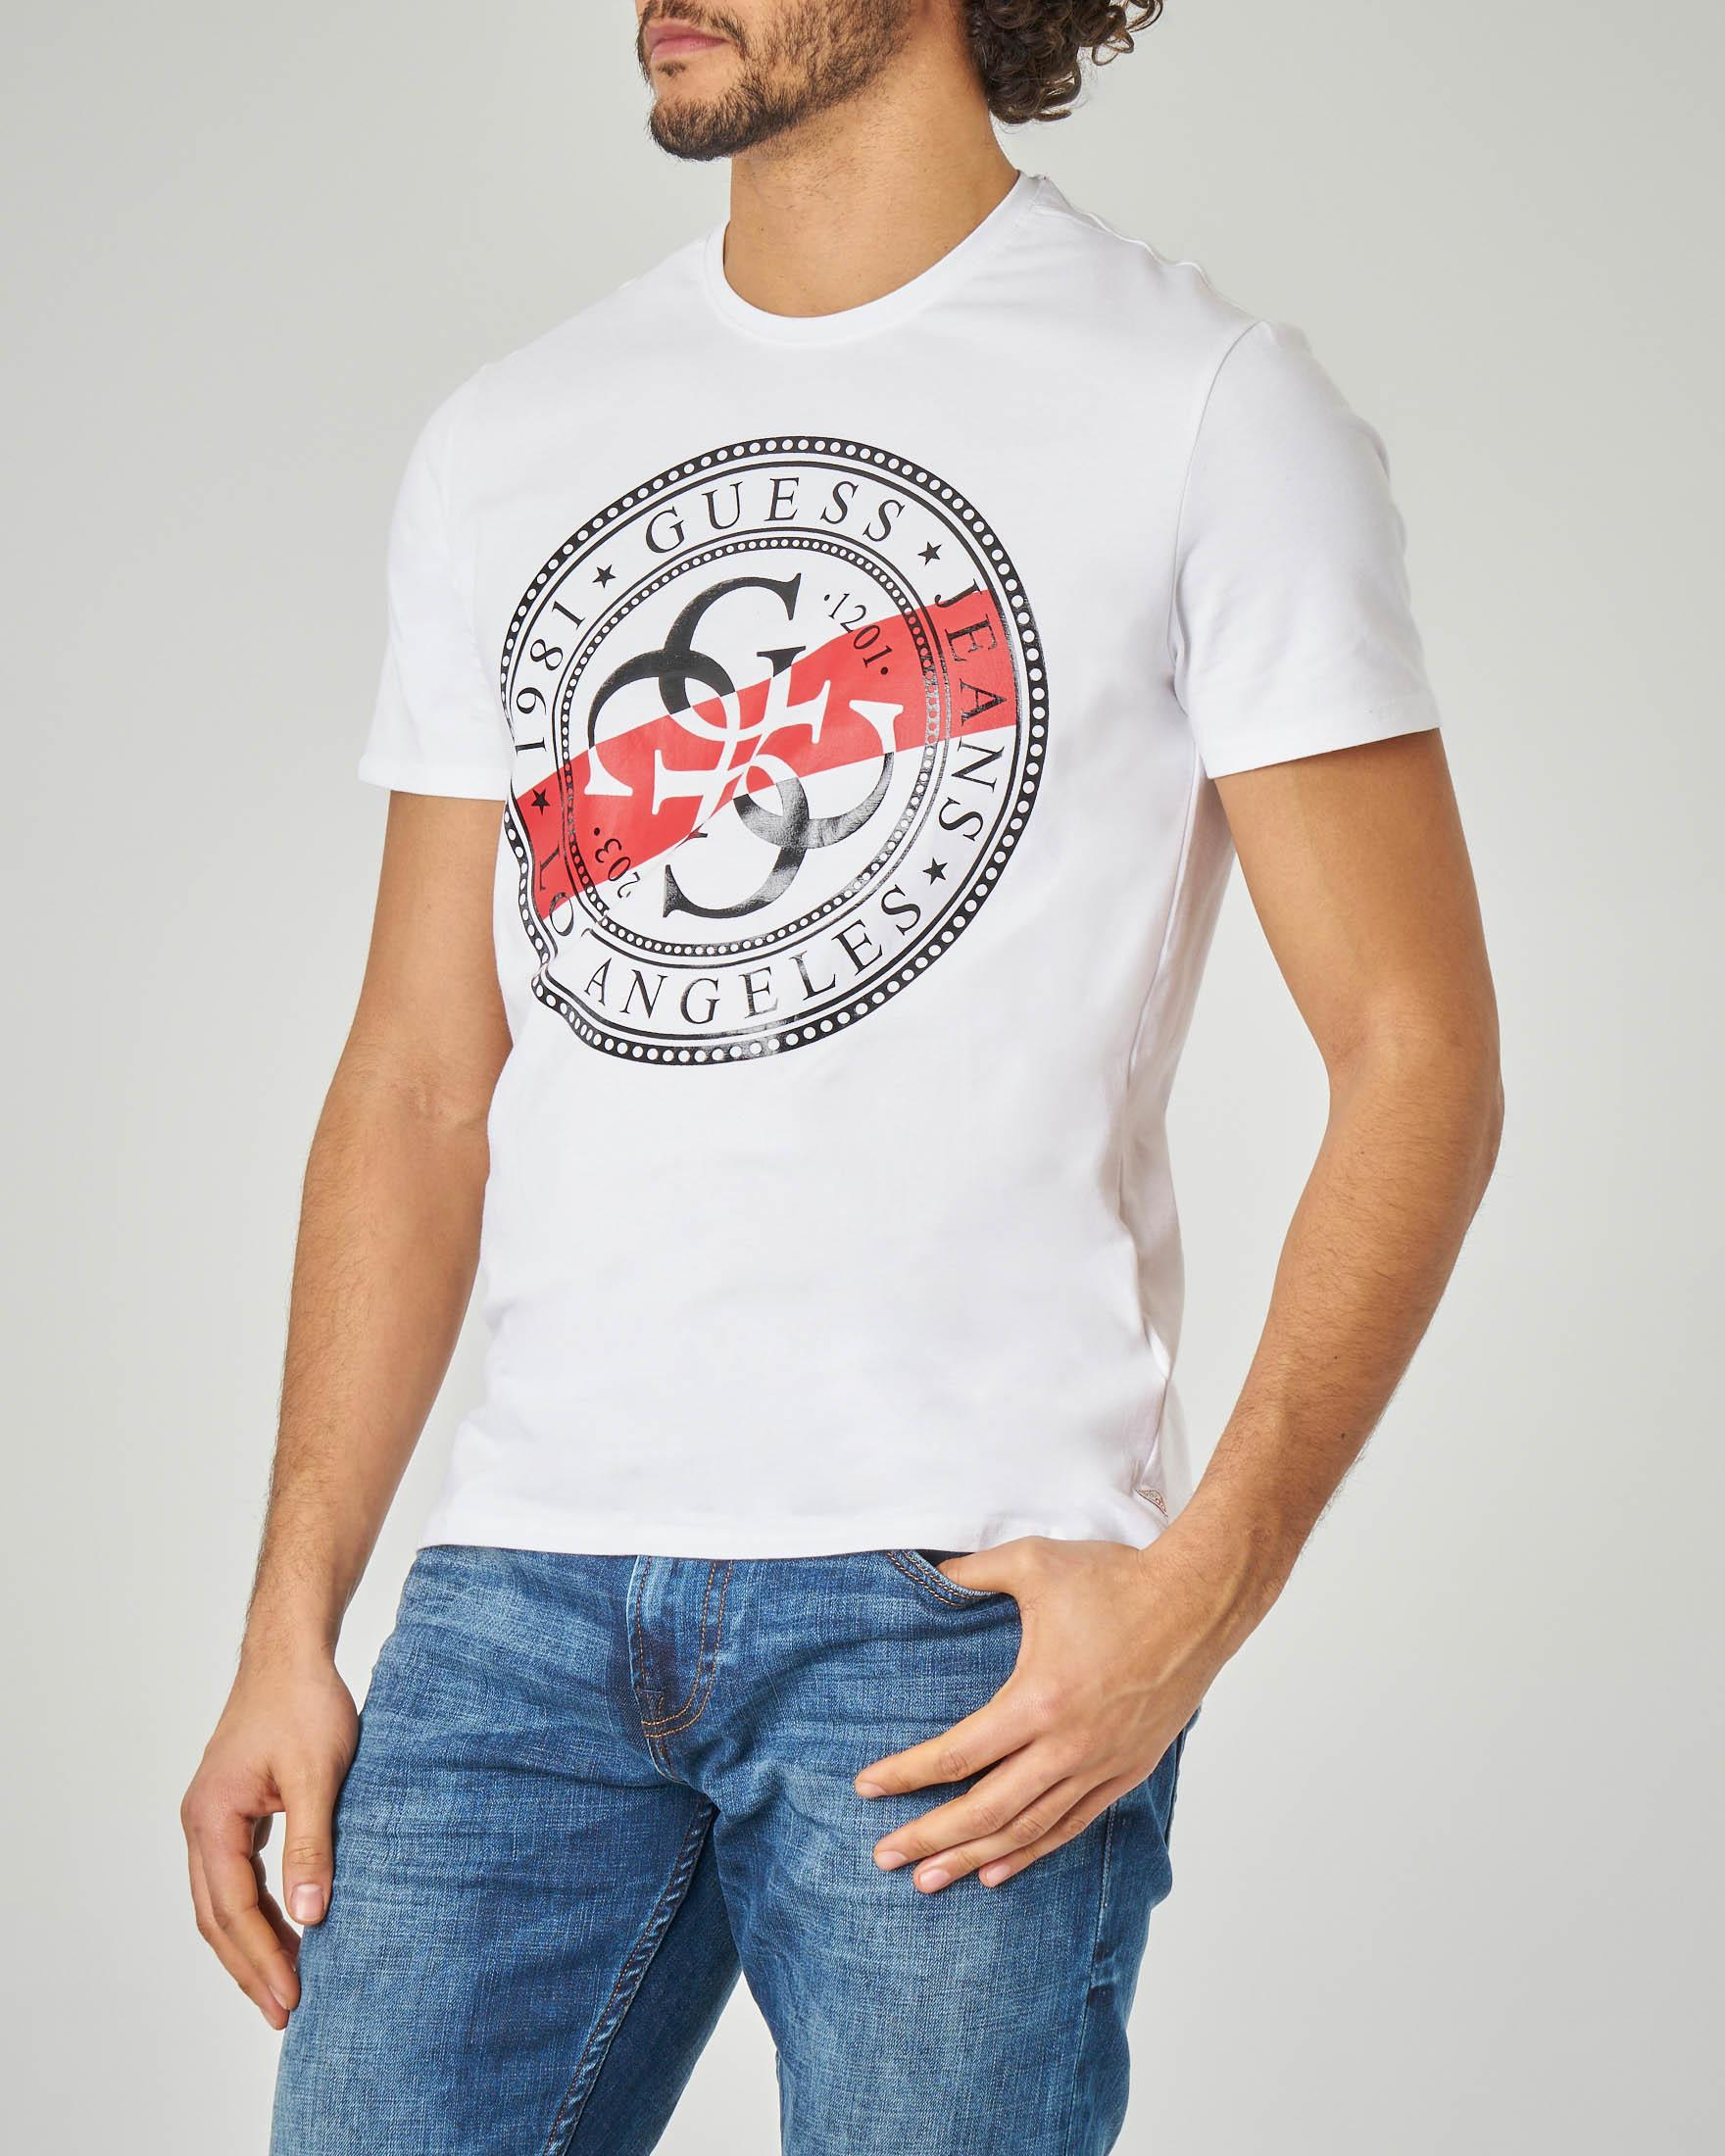 T-shirt bianca con logo bollo 4G